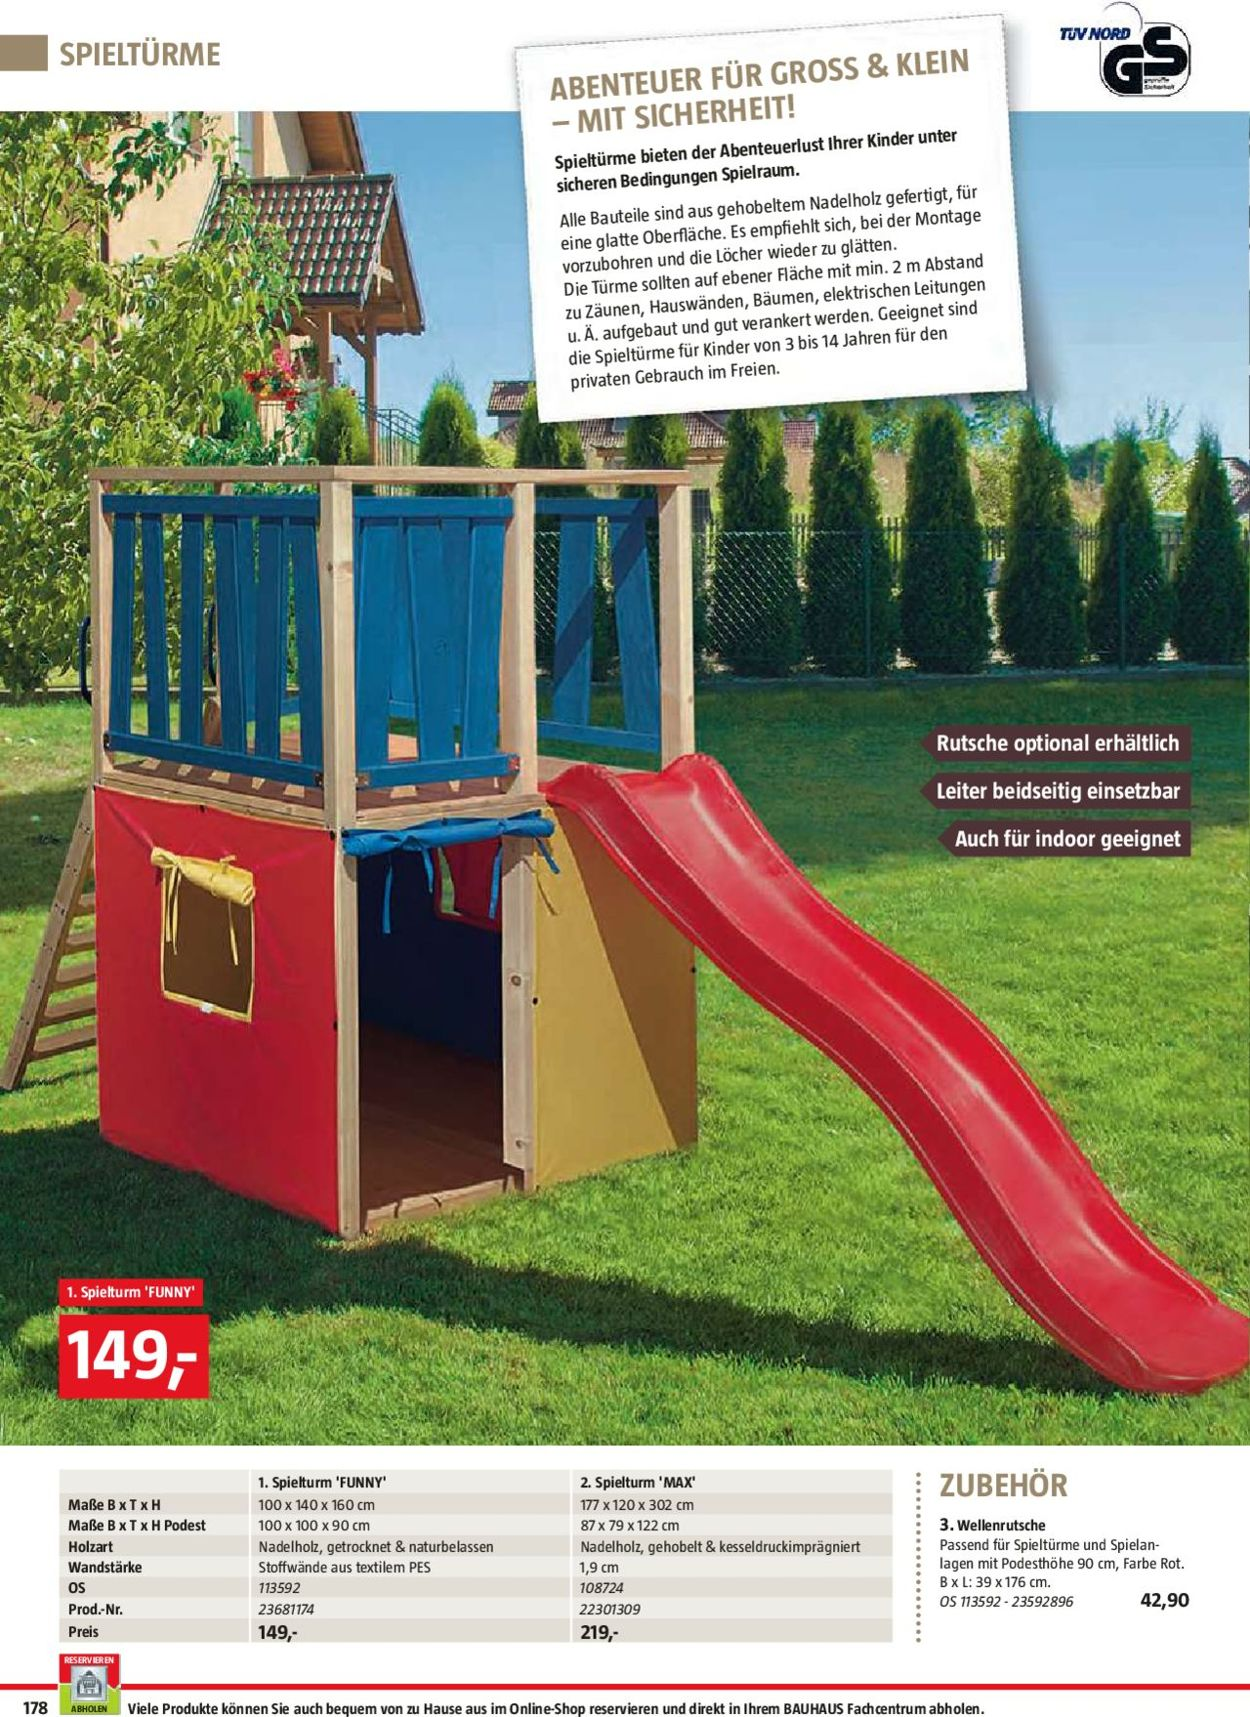 Full Size of Spielturm Bauhaus Aktueller Prospekt 2503 30062019 178 Jedewoche Garten Kinderspielturm Fenster Wohnzimmer Spielturm Bauhaus